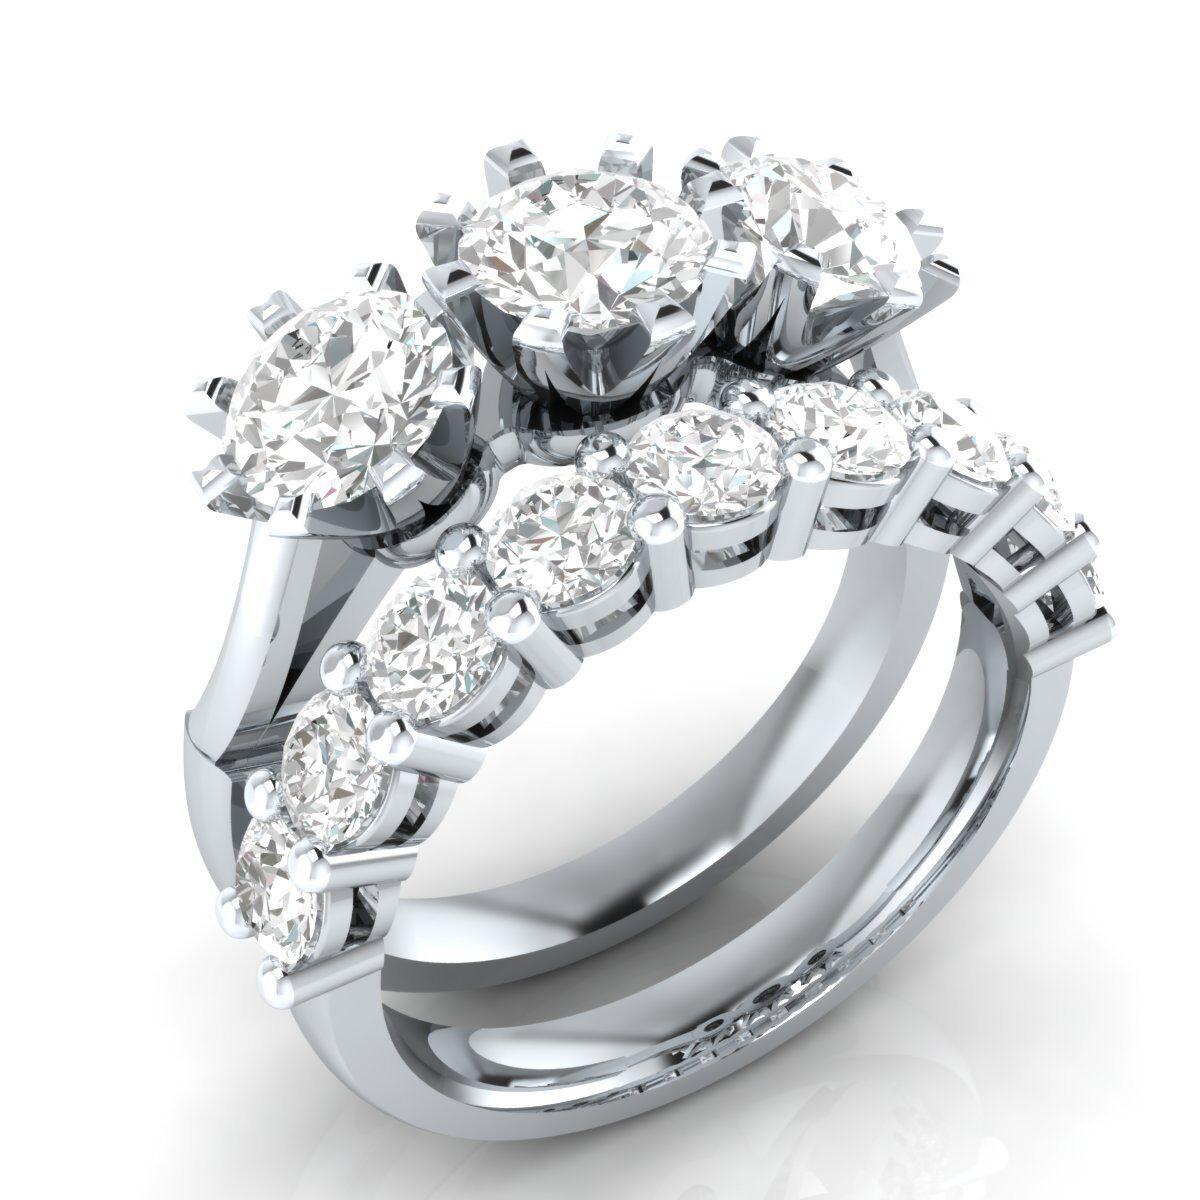 Certified 3.75Ct White Round Cut Diamond 14K gold Engagement & Wedding Ring Set